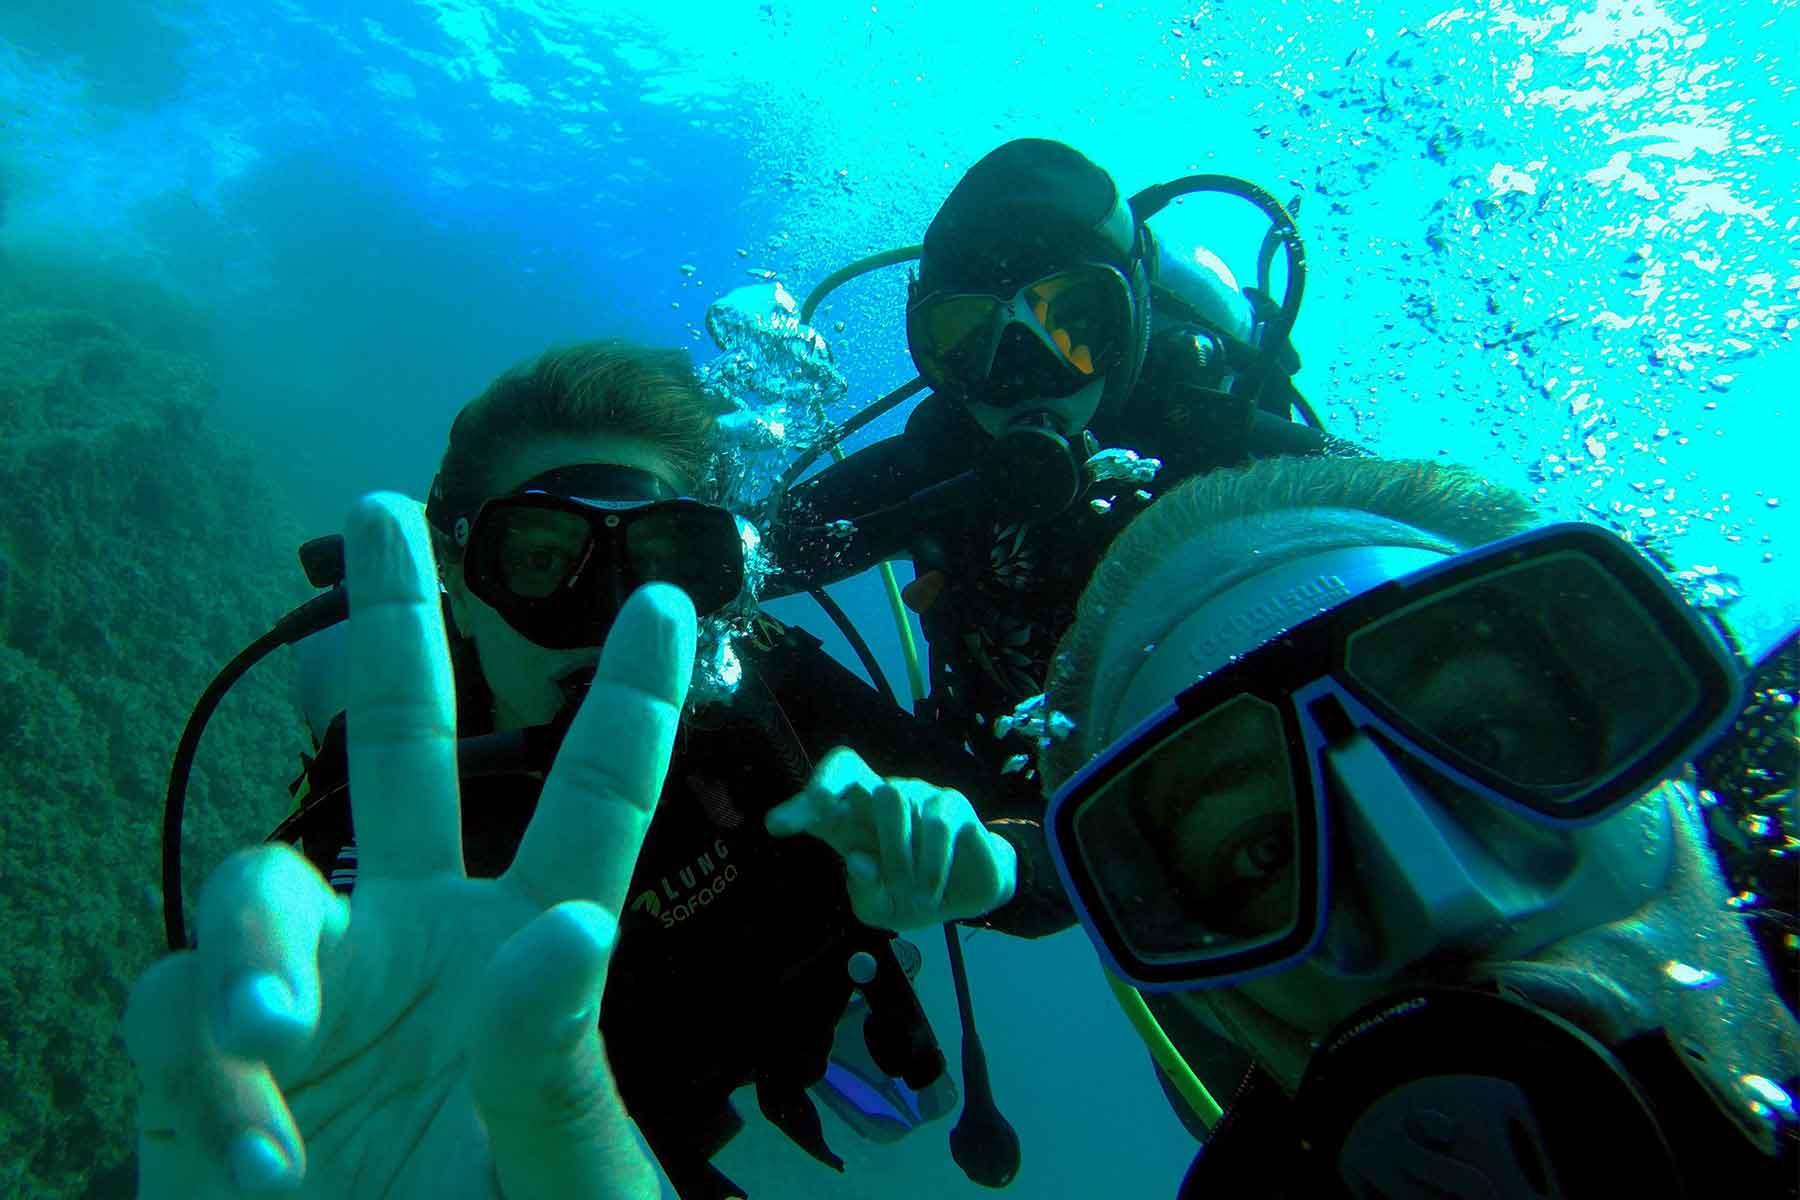 montenegro-try-scuba-diving